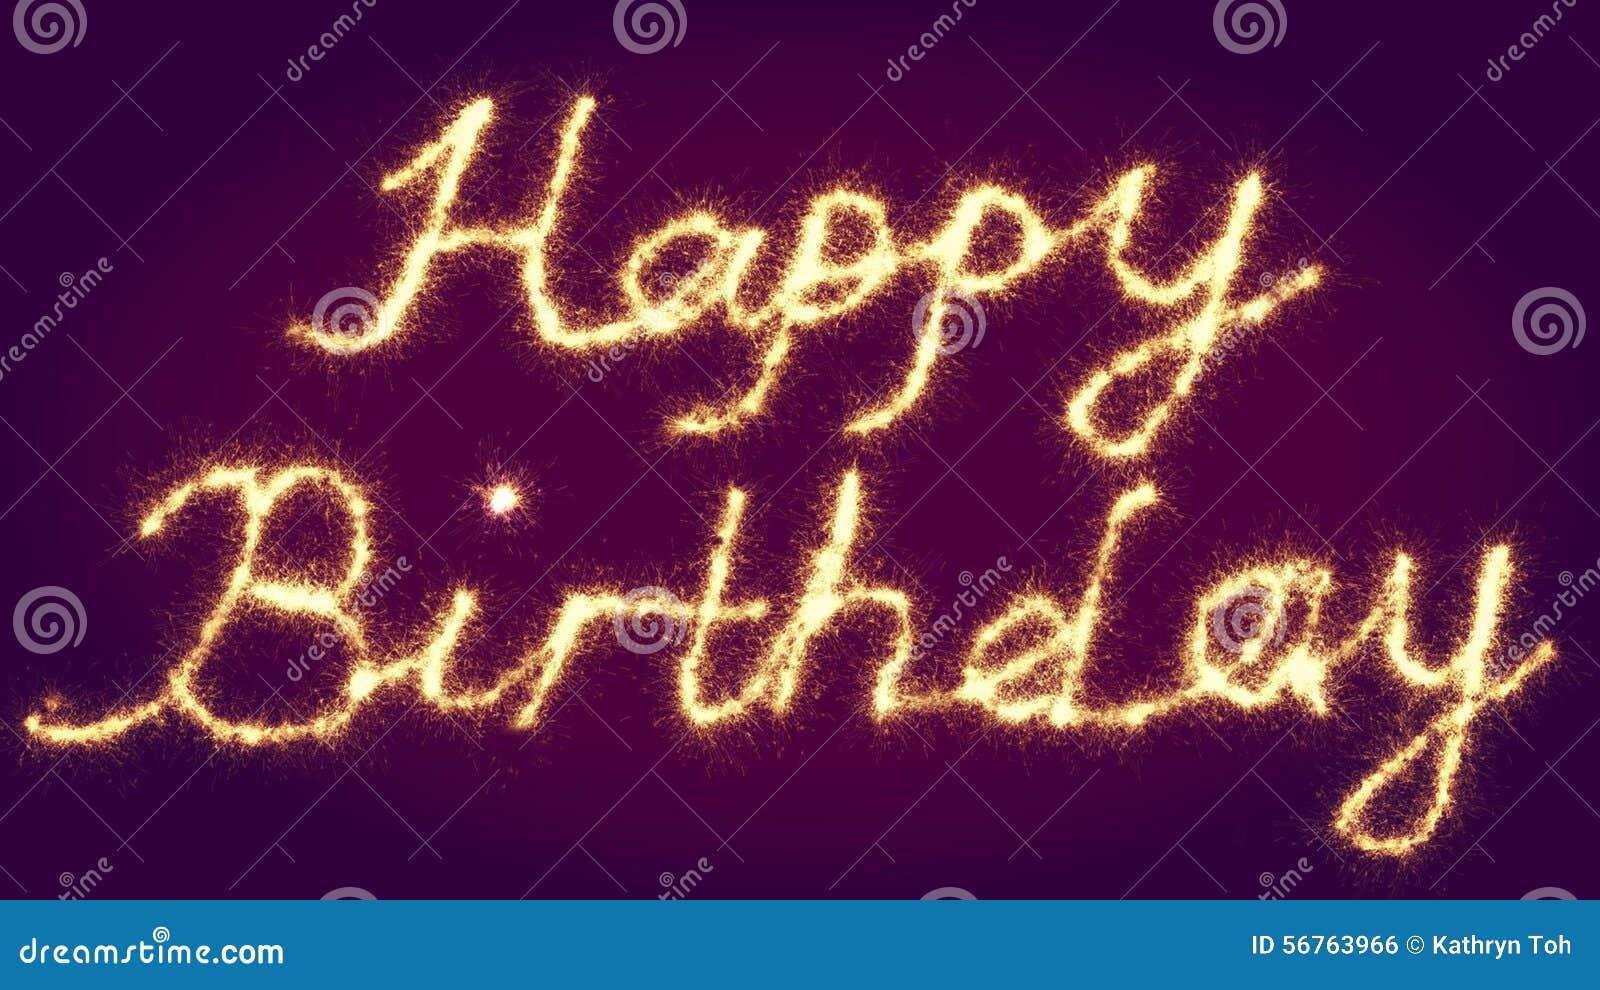 Happy Birthday Signage Stock Illustration Image 56763966